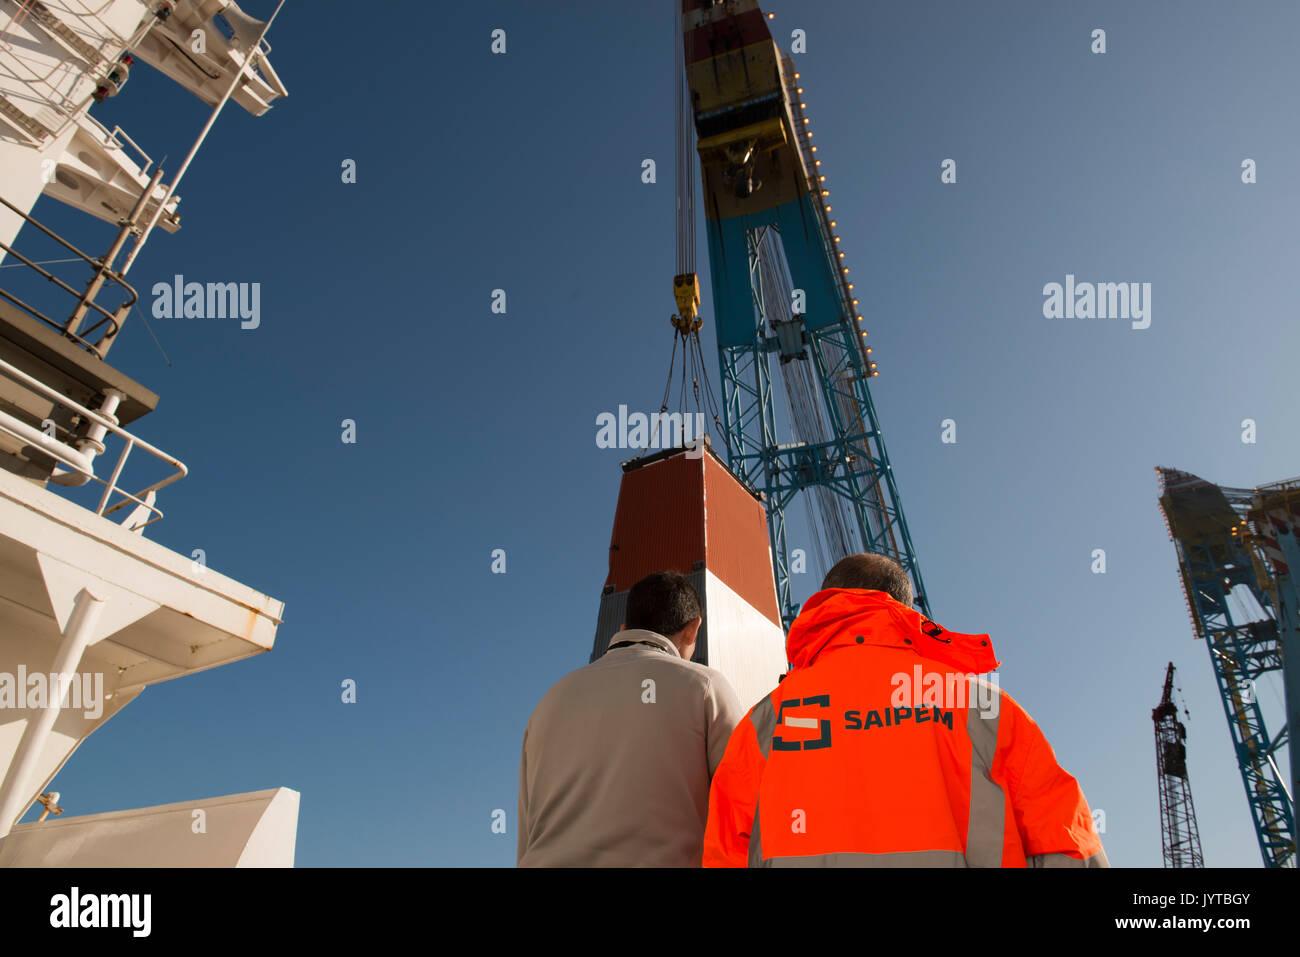 Saipem worker wearing hi-viz coat, watching the removal of a drilling derrick. credit: LEE RAMSDEN / ALAMY Stock Photo